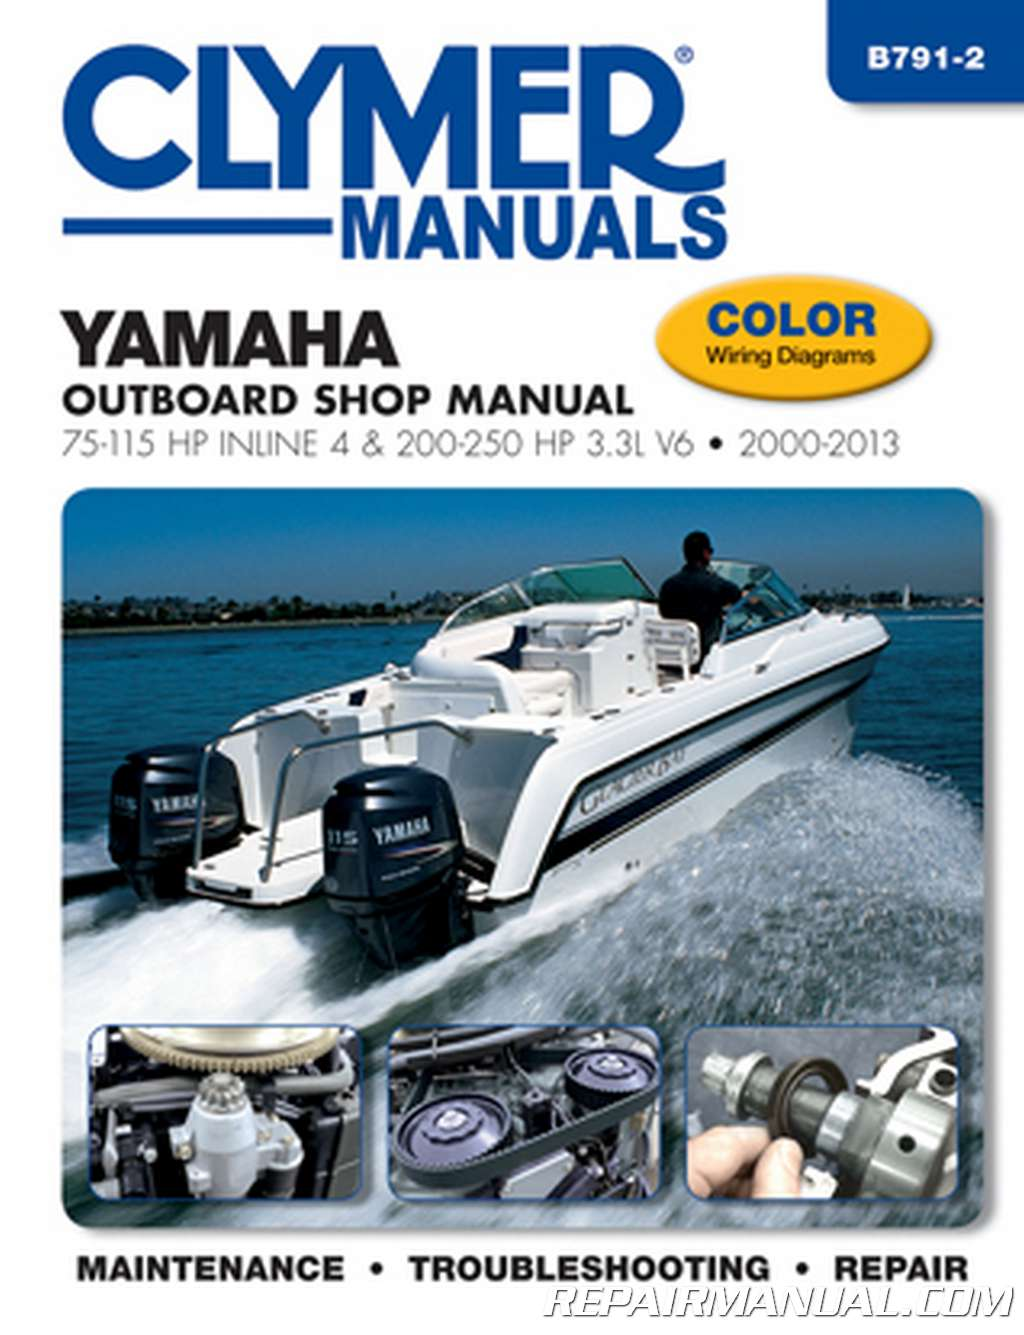 1993 yamaha 4 hp outboard service repair manual